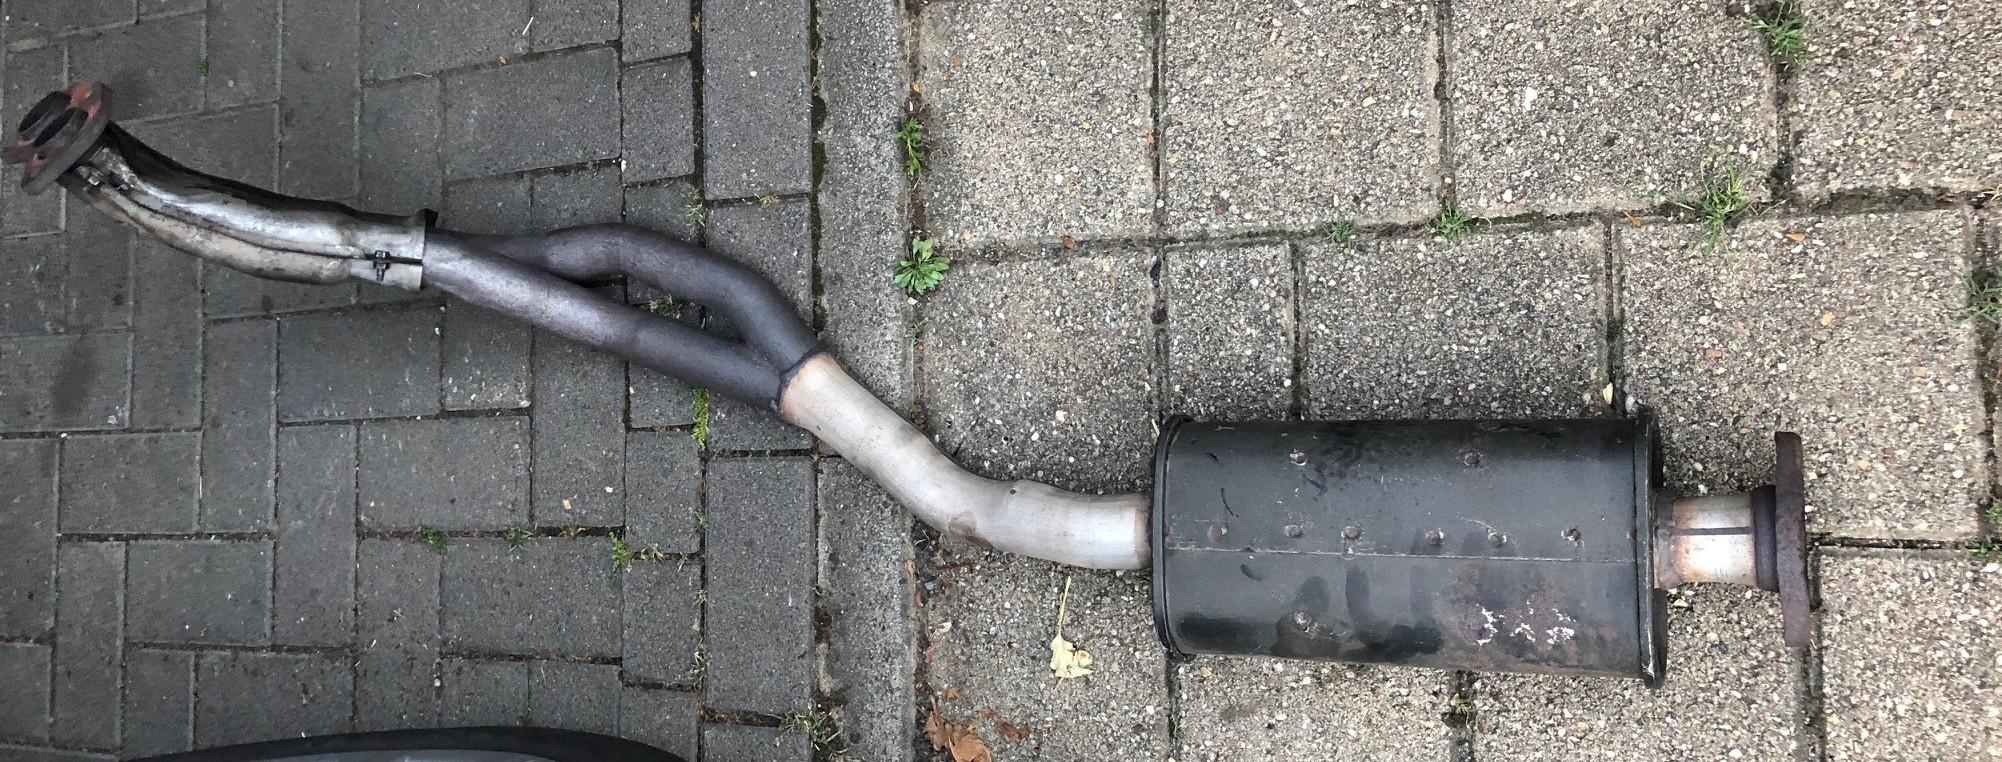 [Image: AEU86 AE86 - HKS Legal exhaust]